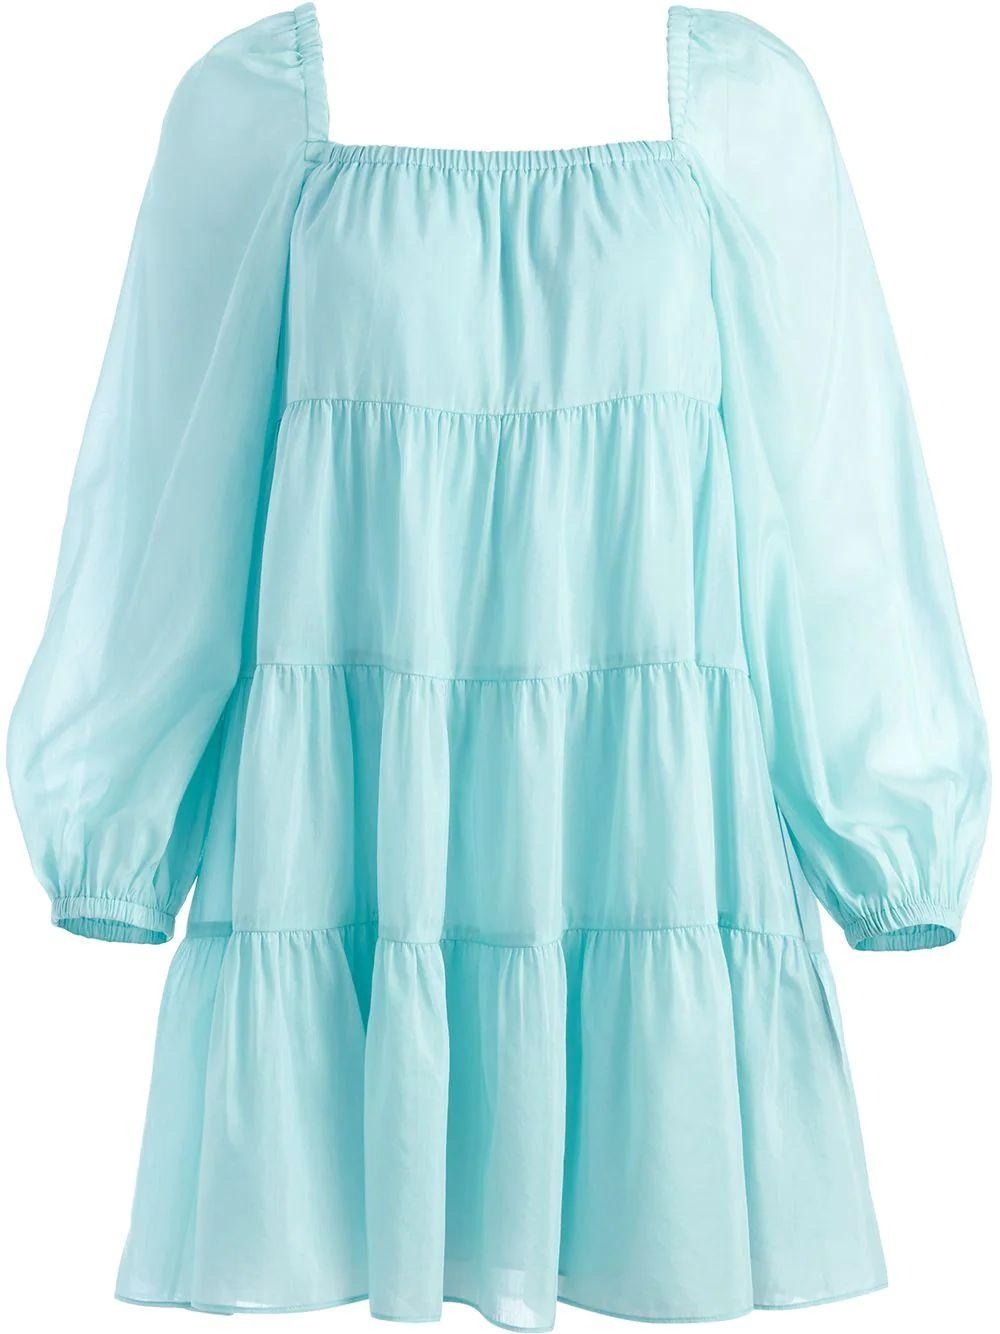 Rowen Tiered Tunic Dress